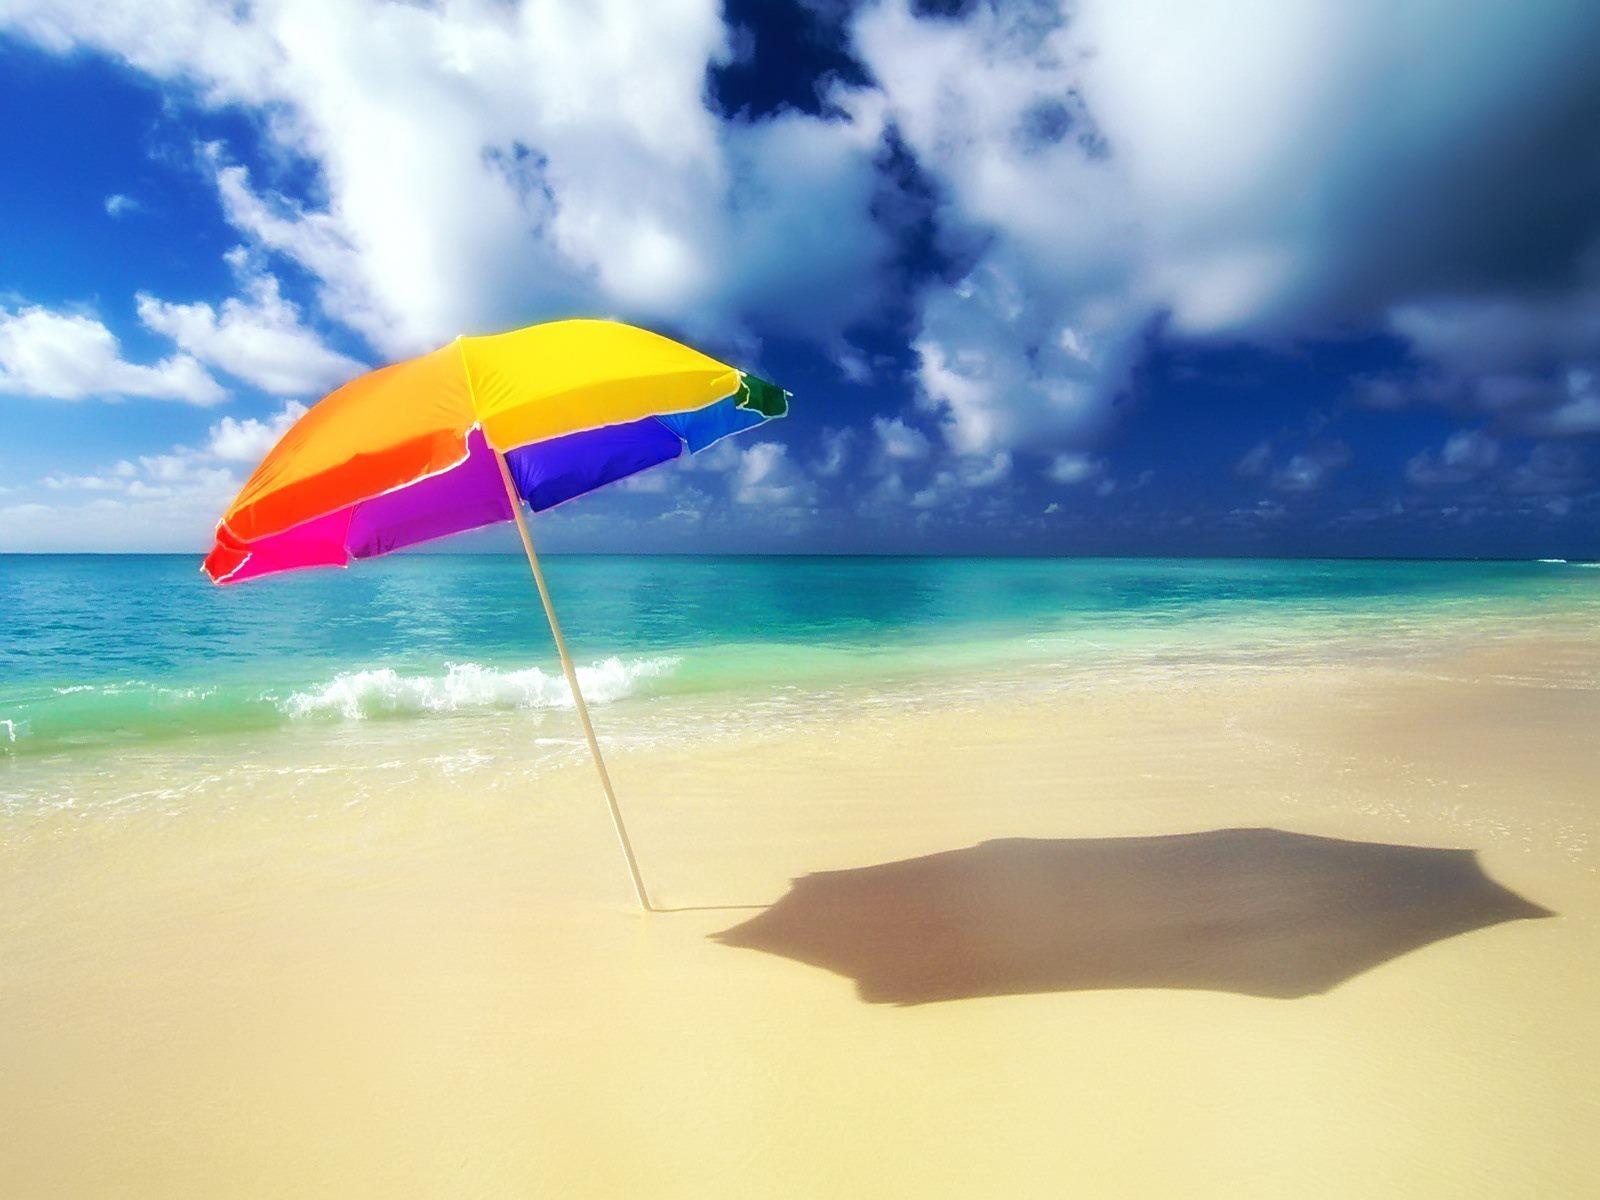 Sun umbrella Wallpaper Beaches Nature Wallpapers in jpg format for